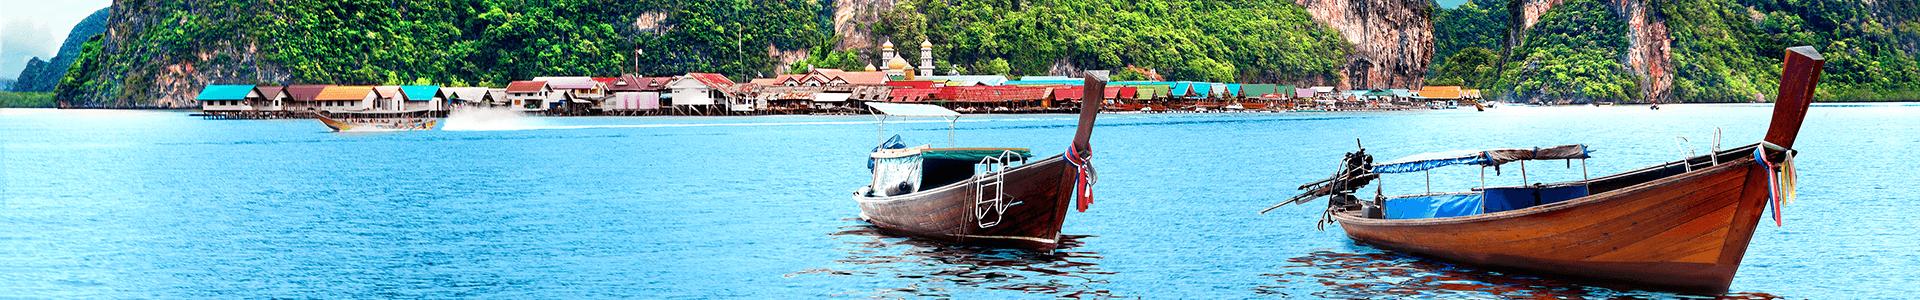 Voyage à Phuket